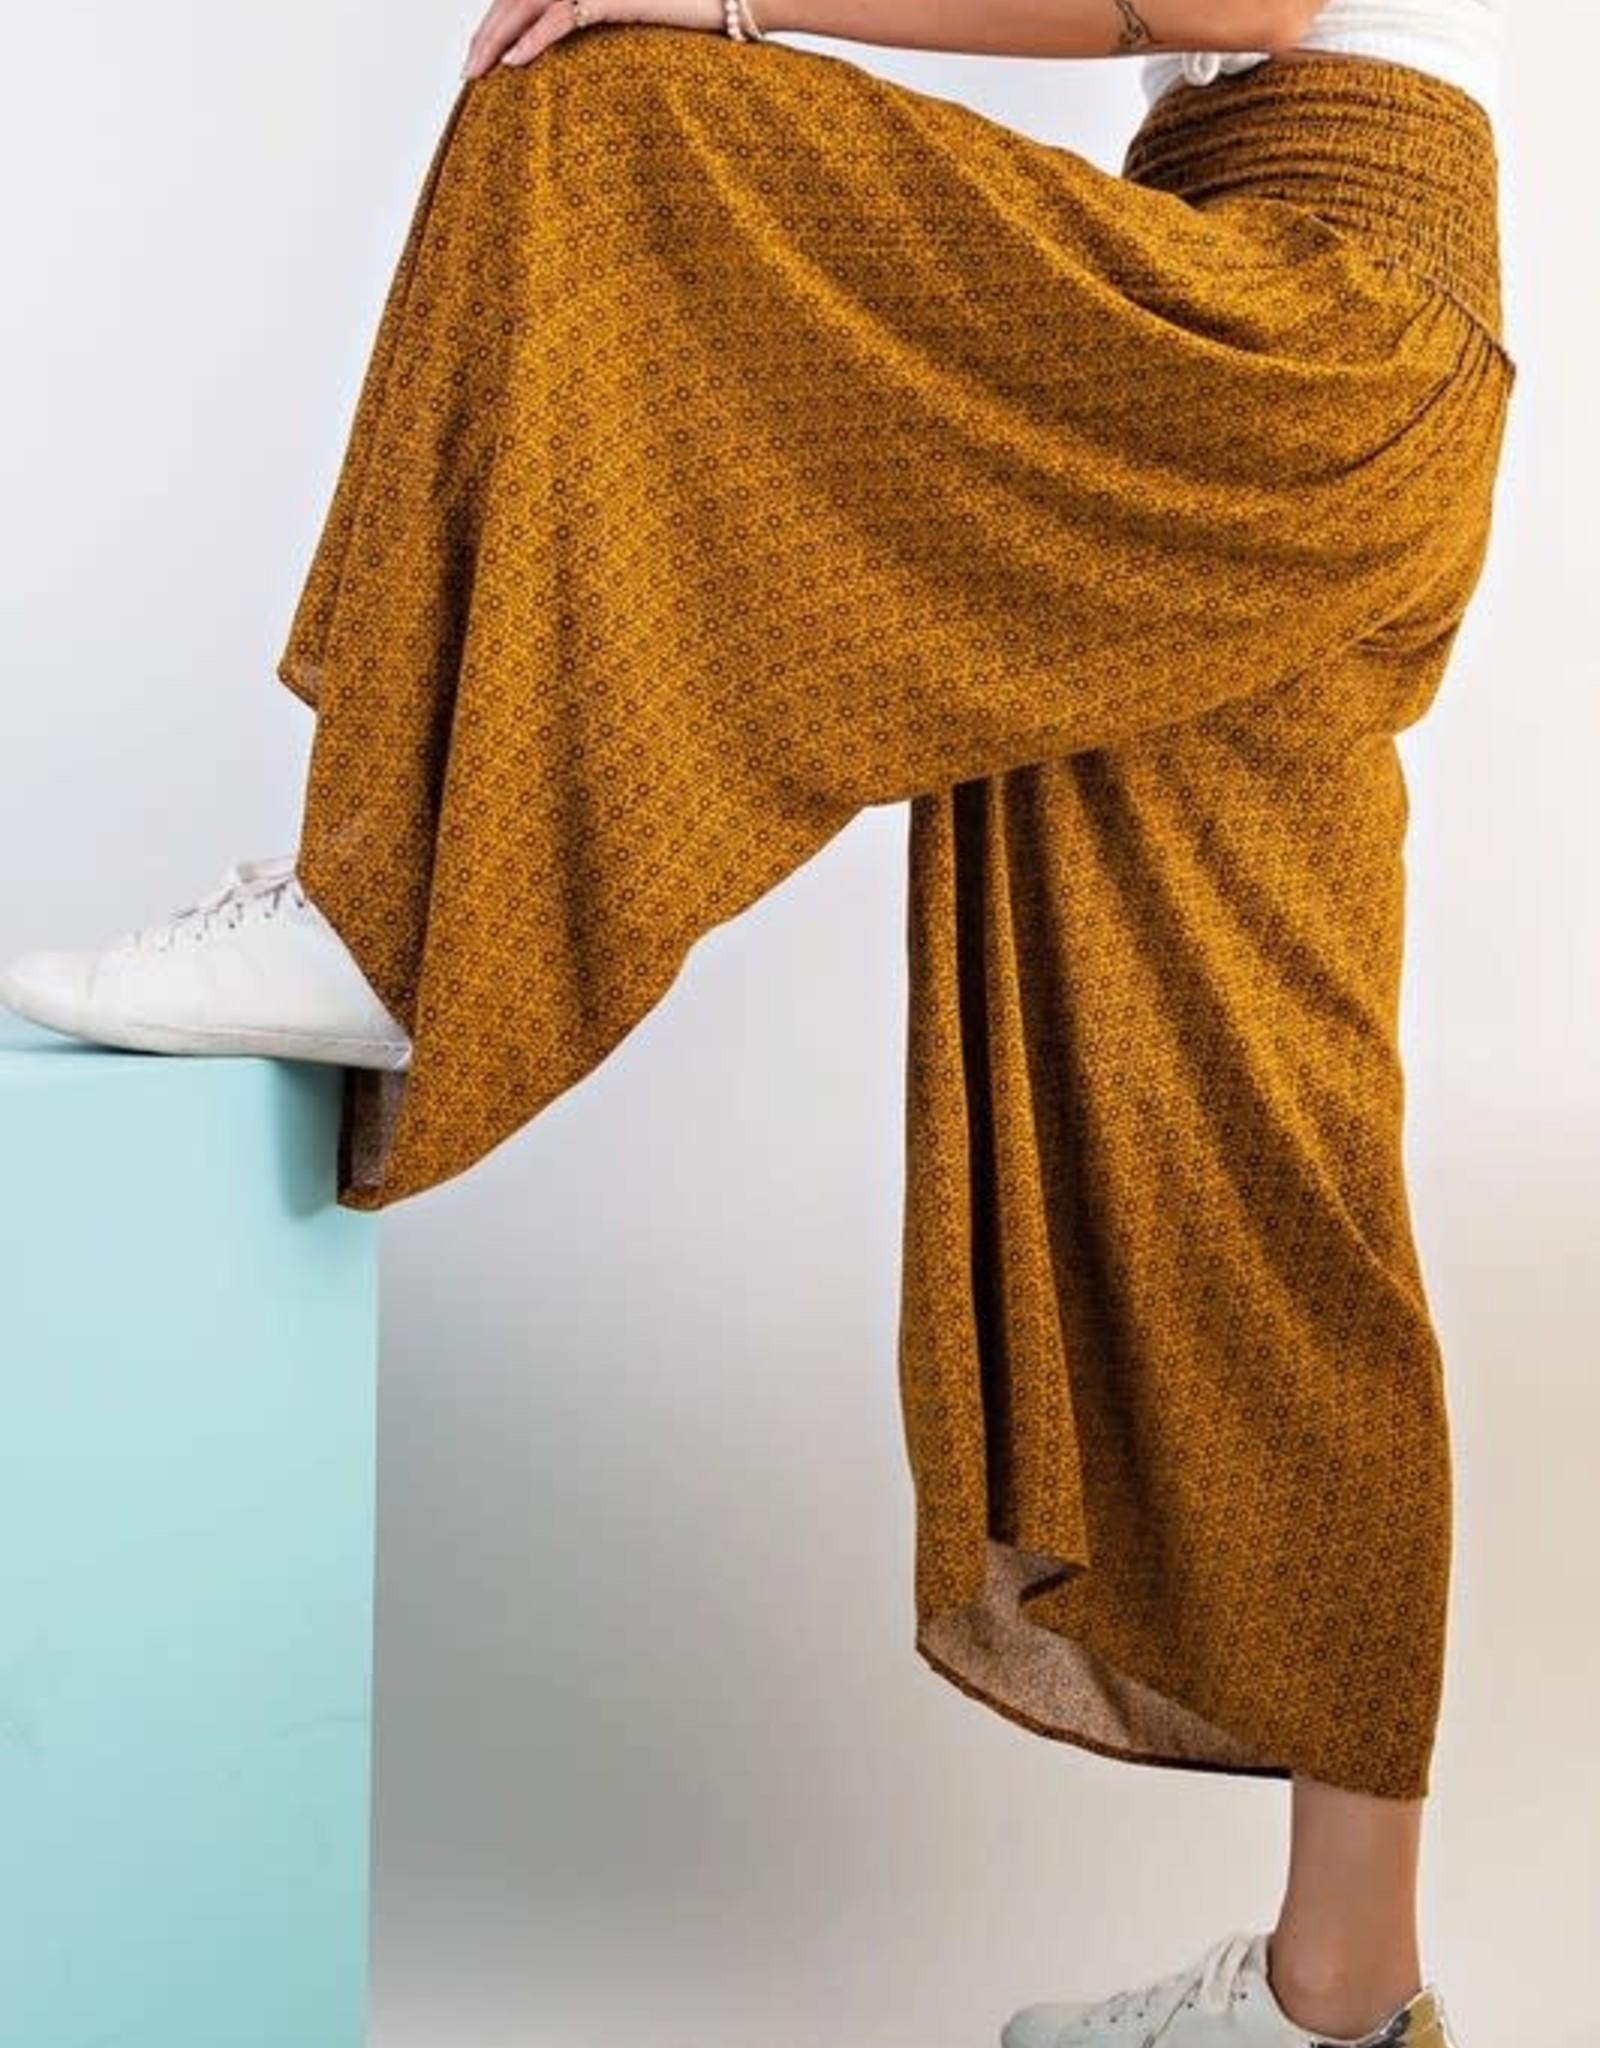 Keeping Cool Pants